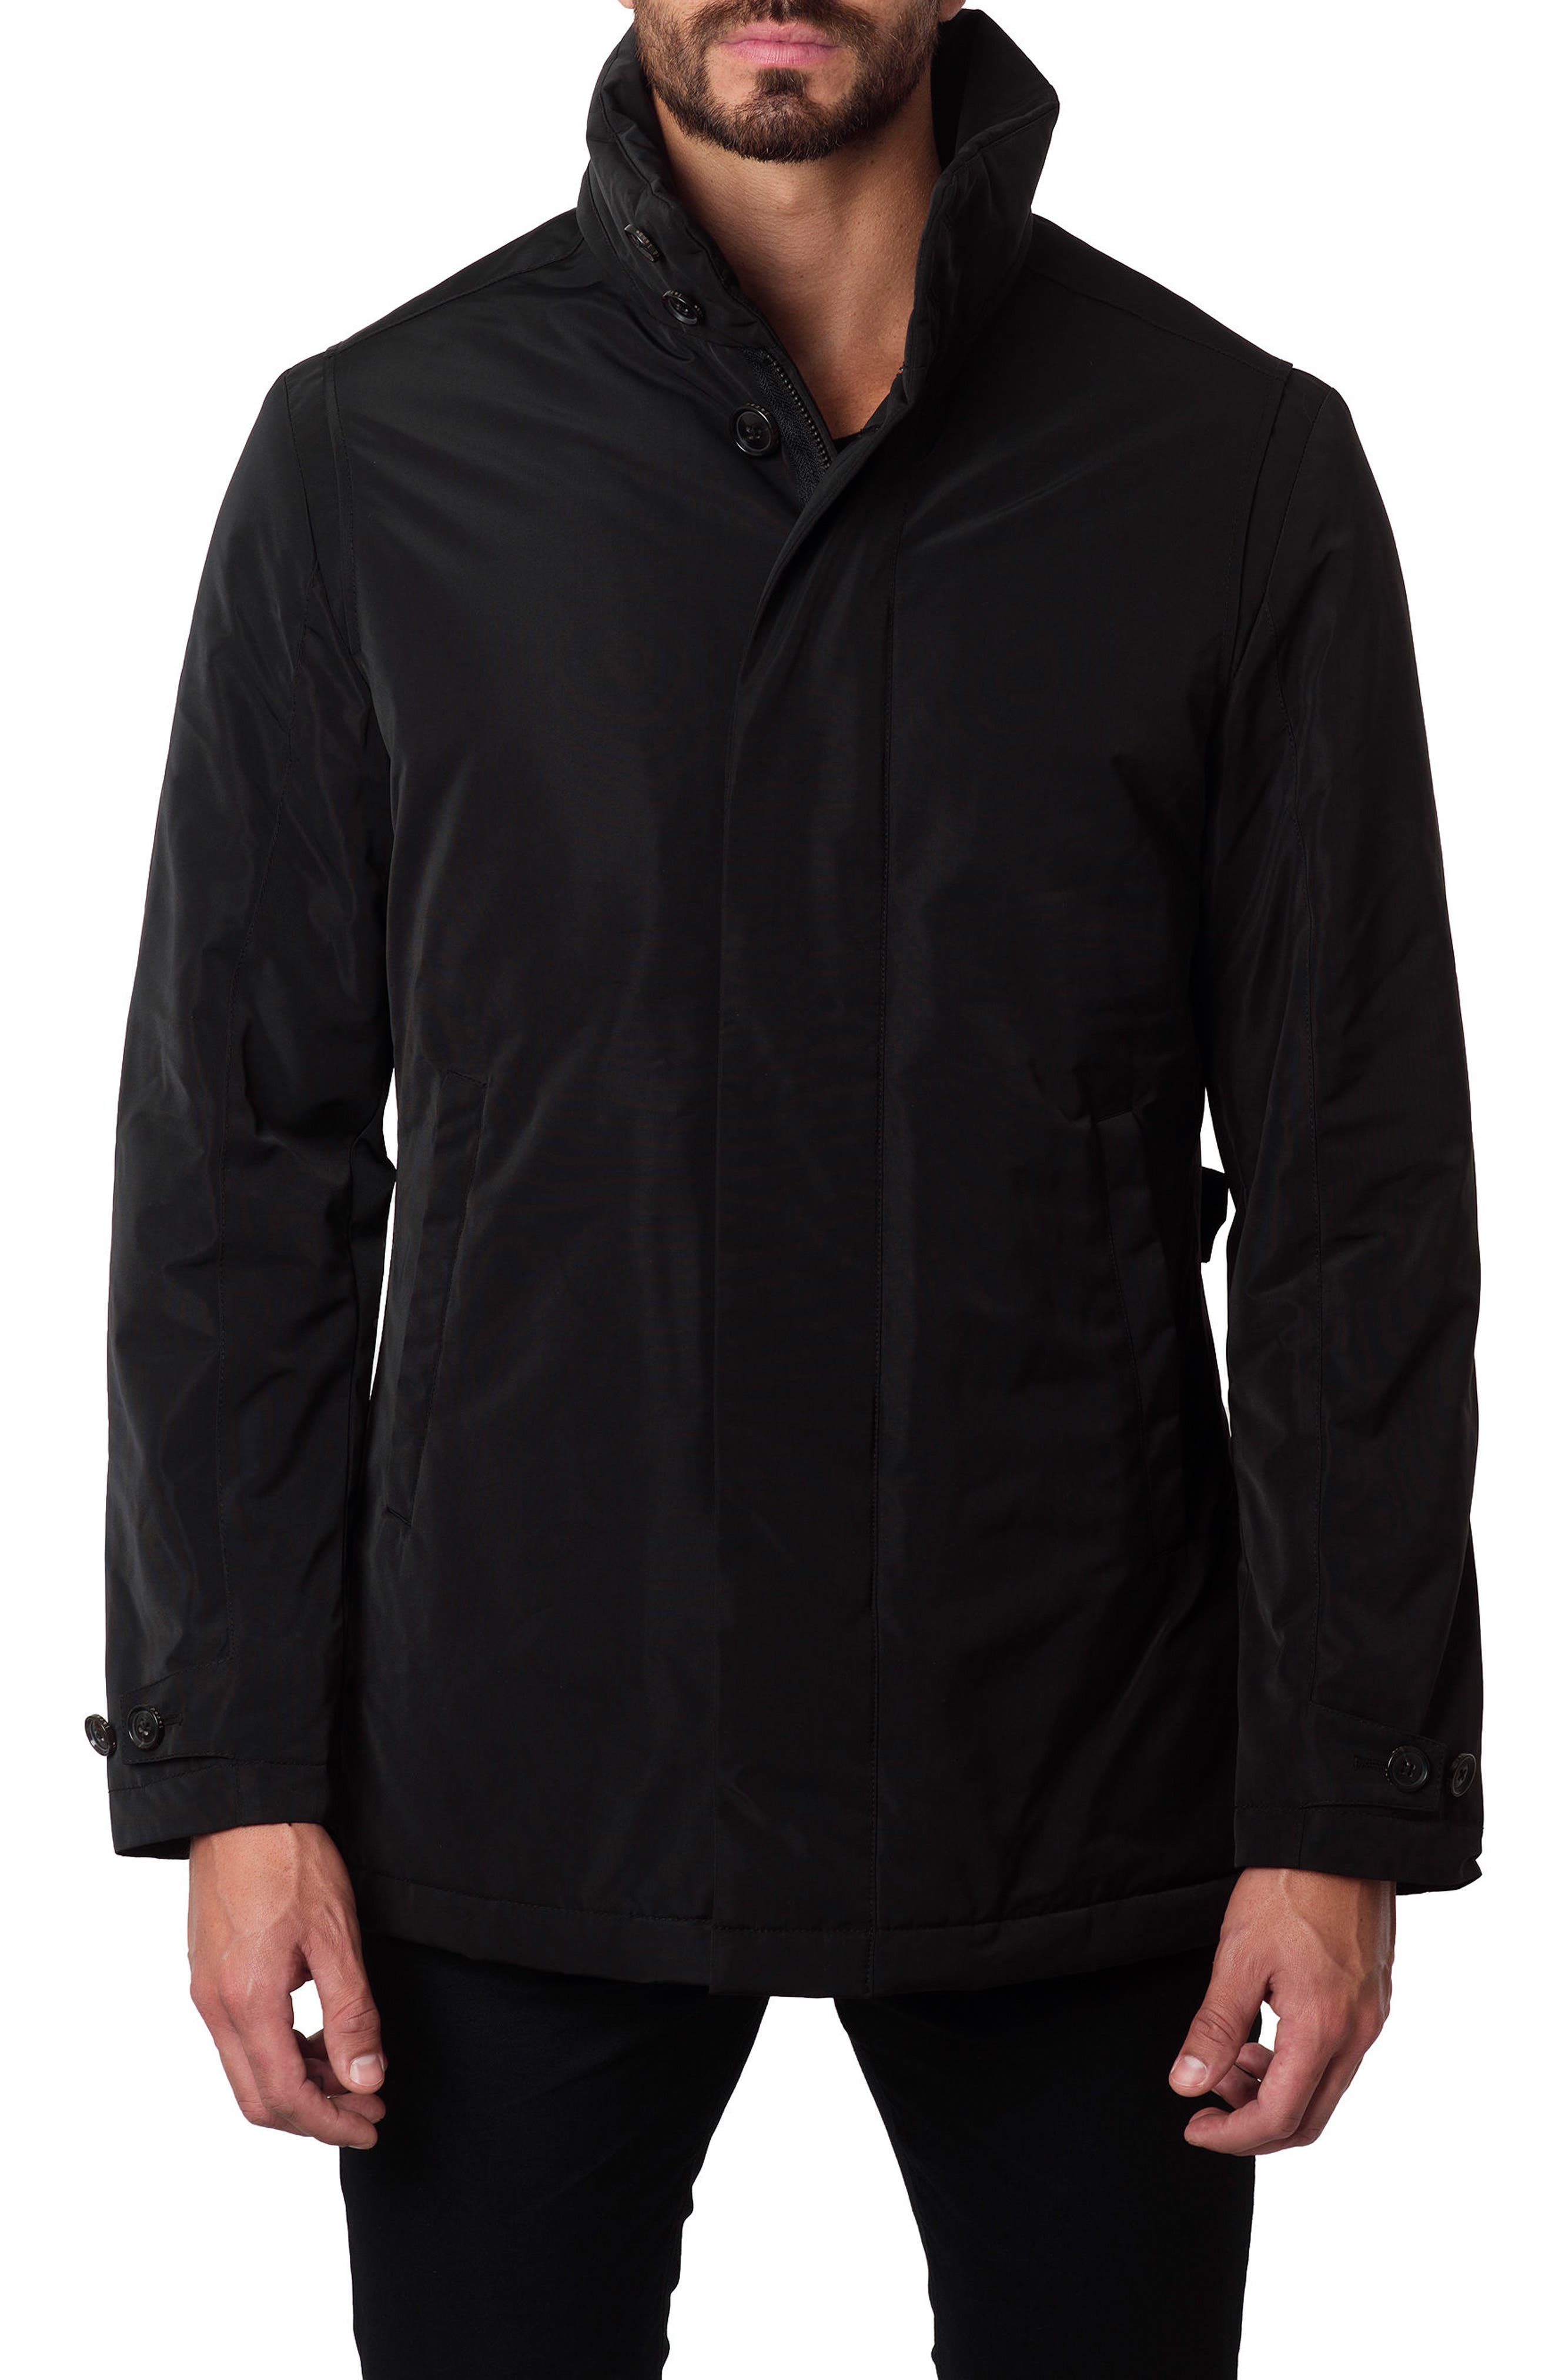 Main Image - Jared Lang Water-Repellent Jacket